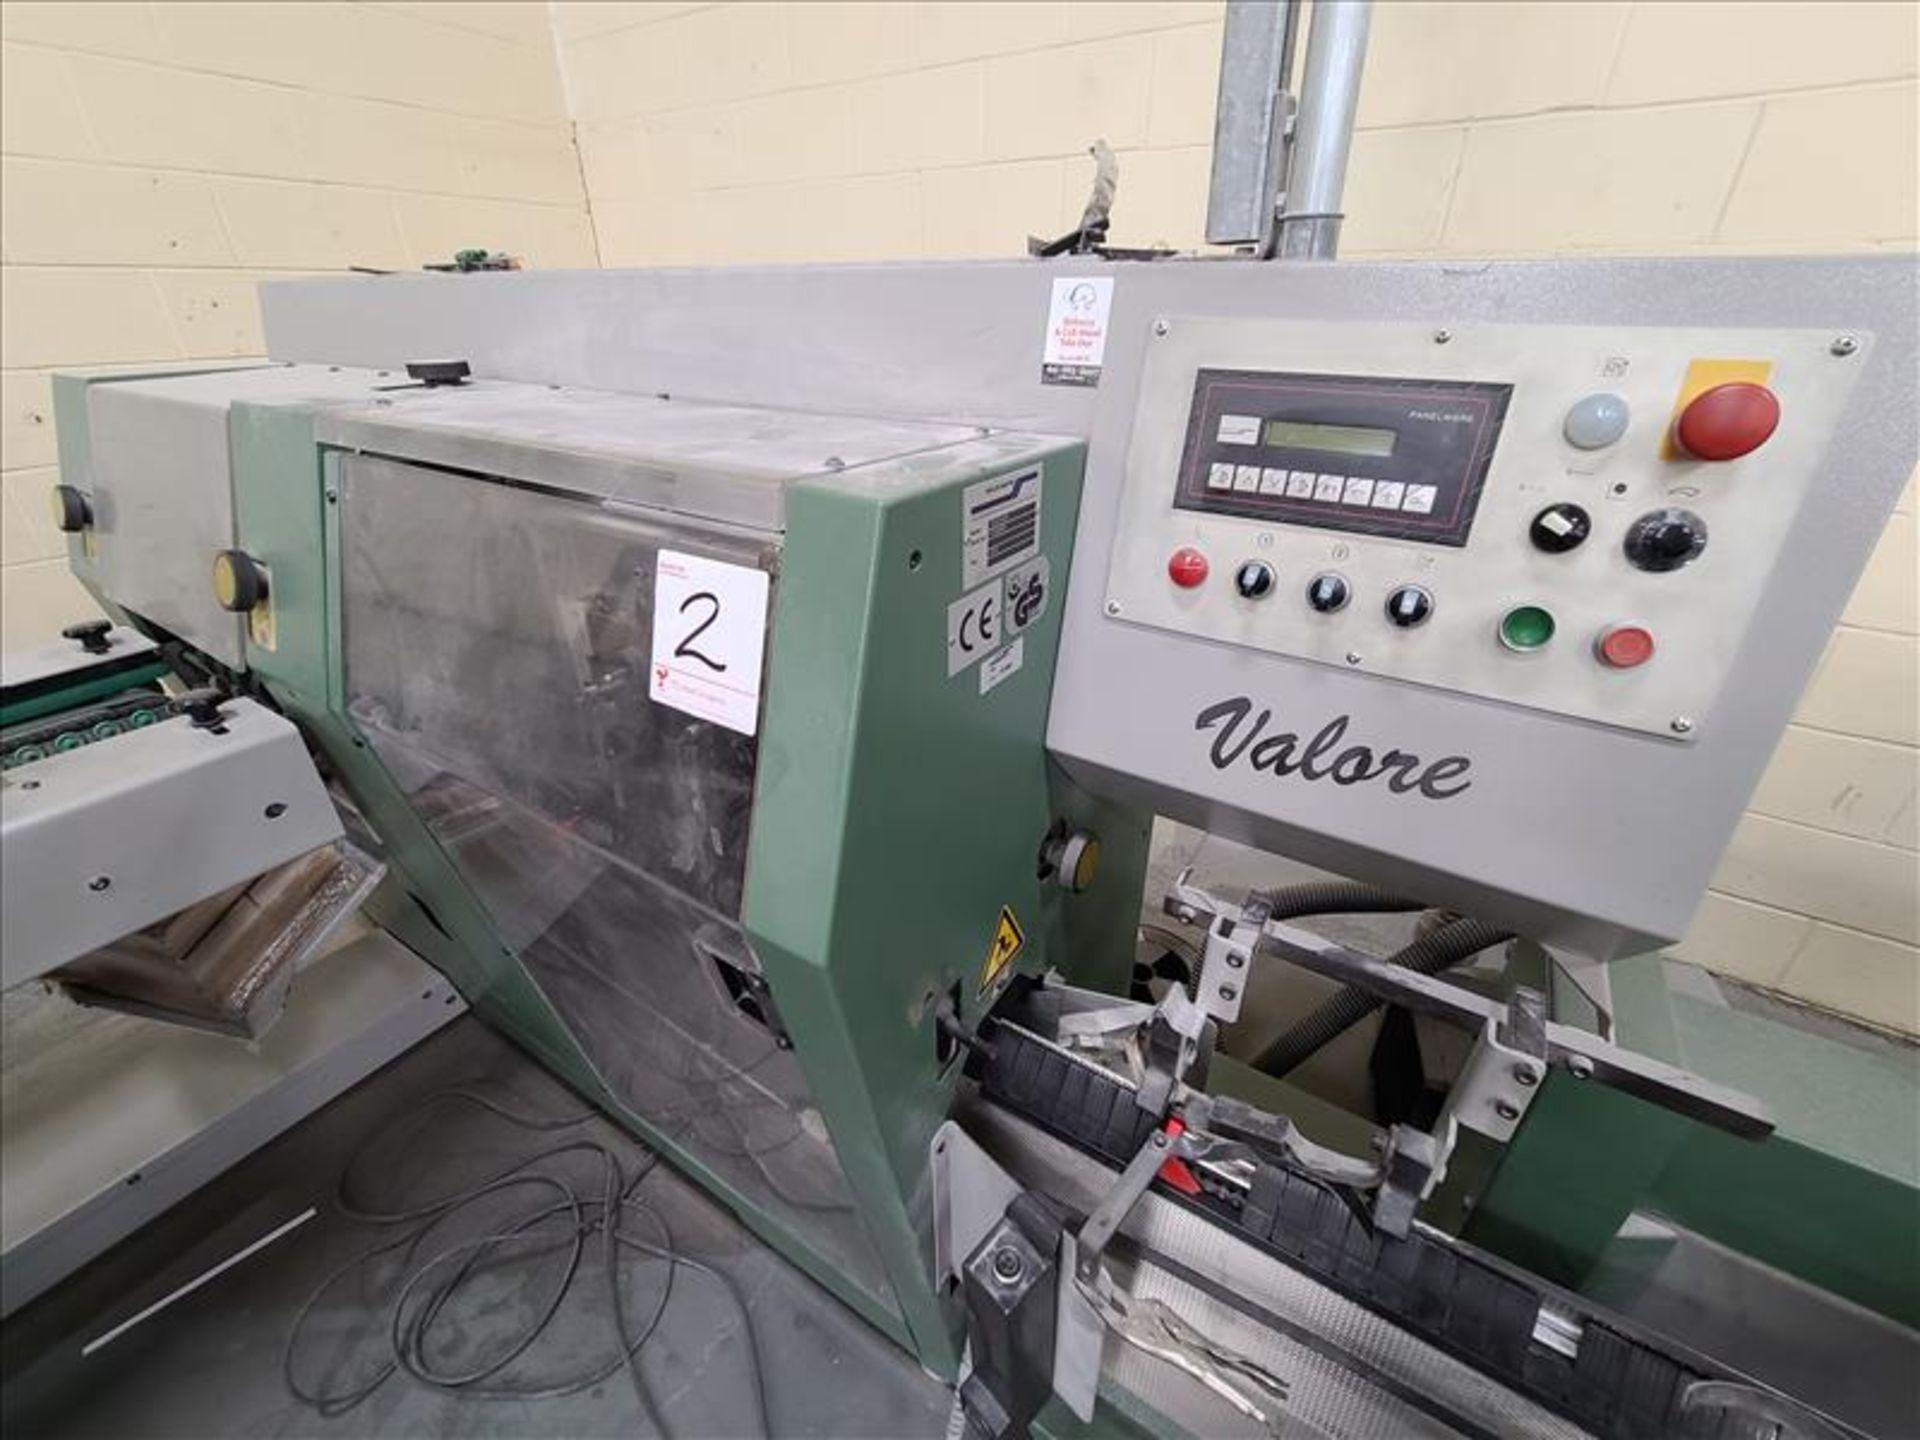 Muller Martini,Valore, 8 Station Saddle Stitcher, model 1558.0404, S/N.NN25808, 230V, 3 Phase, - Image 4 of 13